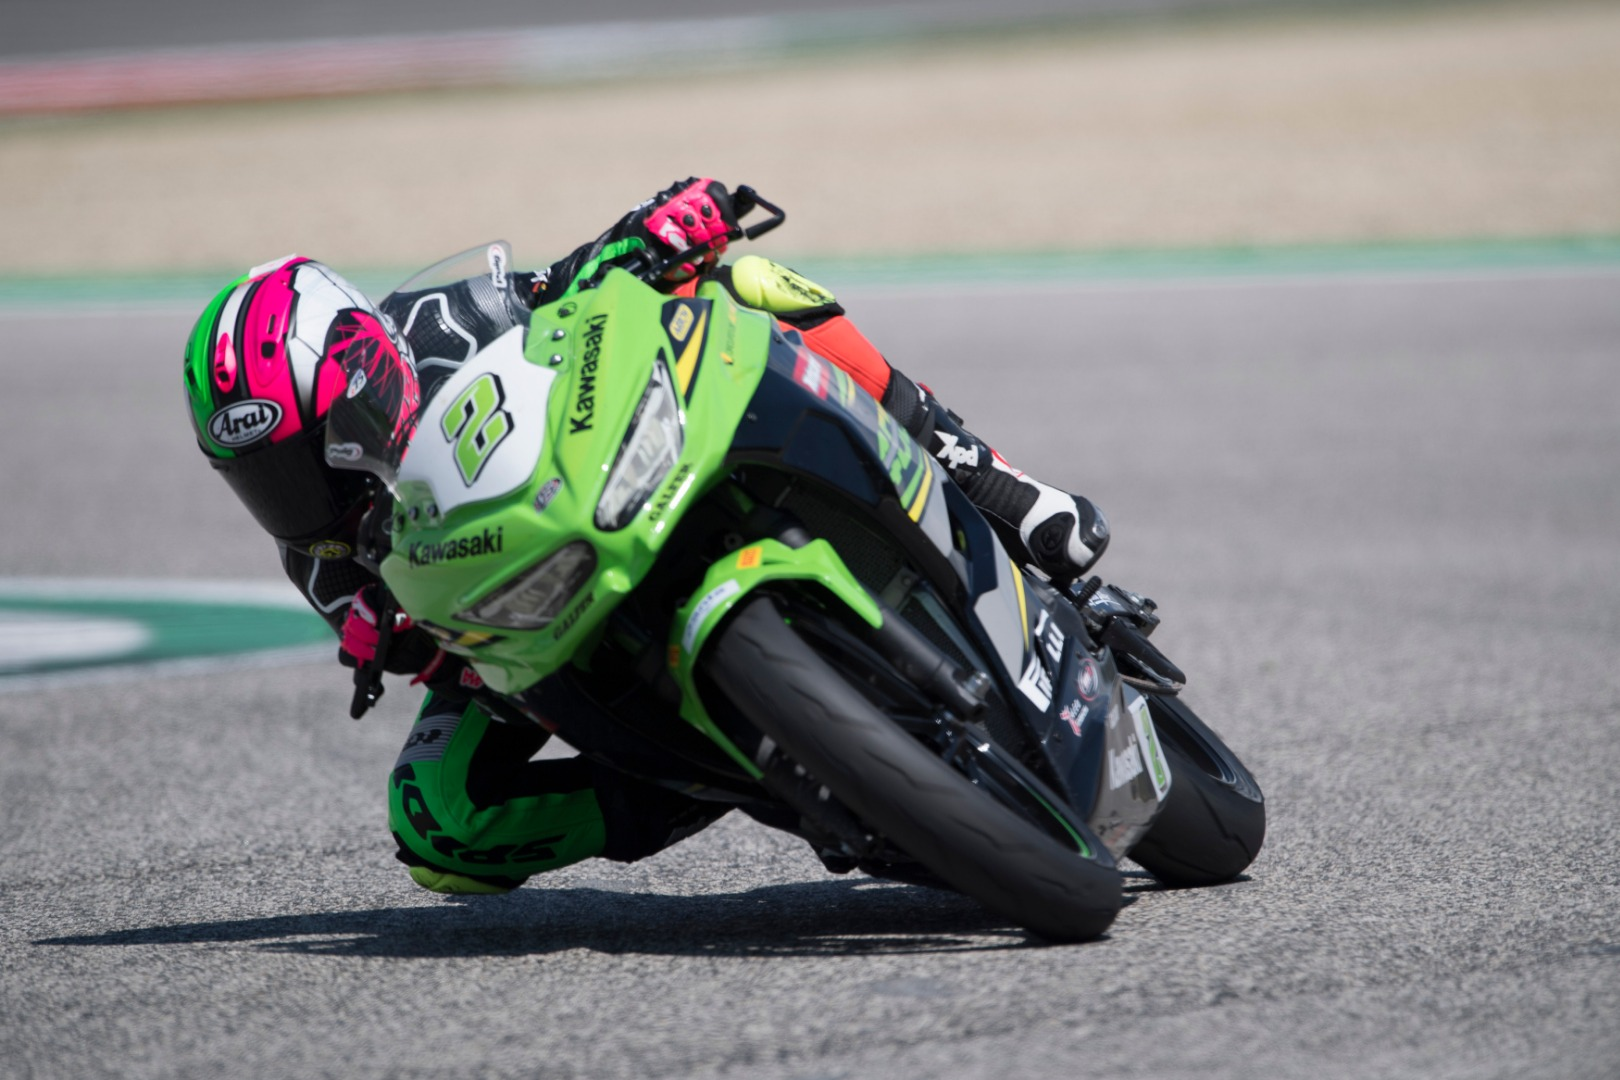 Penguin Motocross Rider Motorcycles Garage Full Speed Cafe R Womens T-Shirt C604